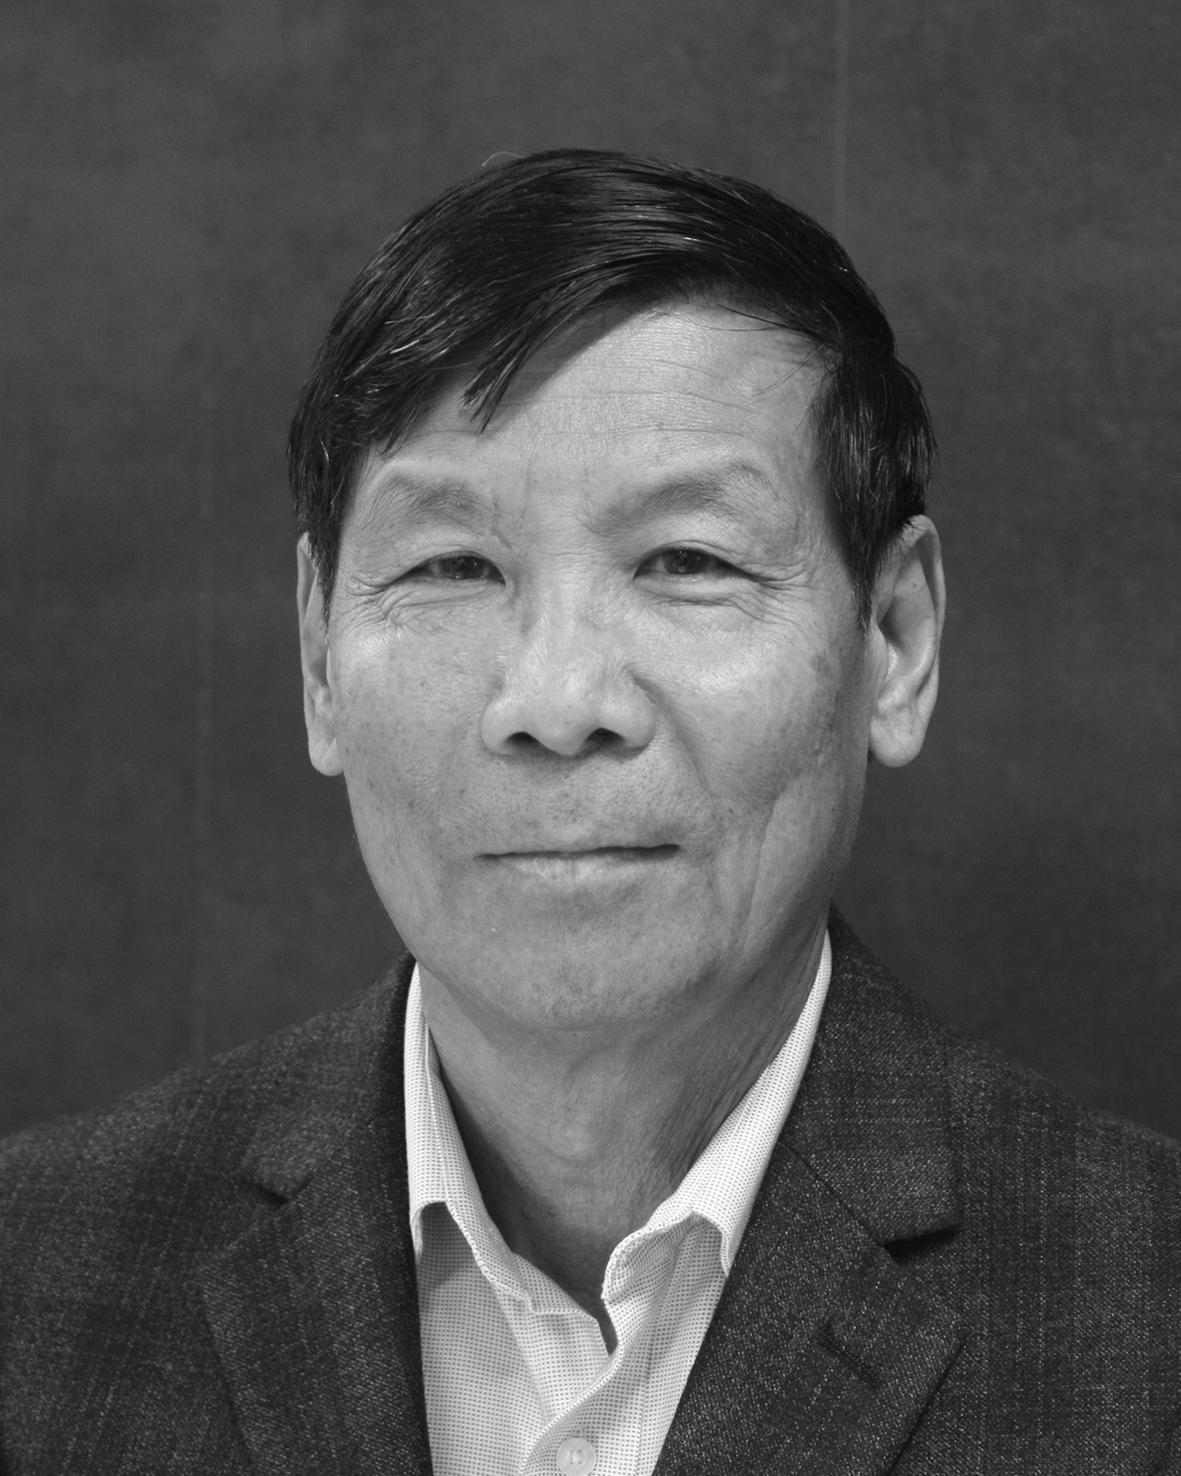 Chin Leong LAW